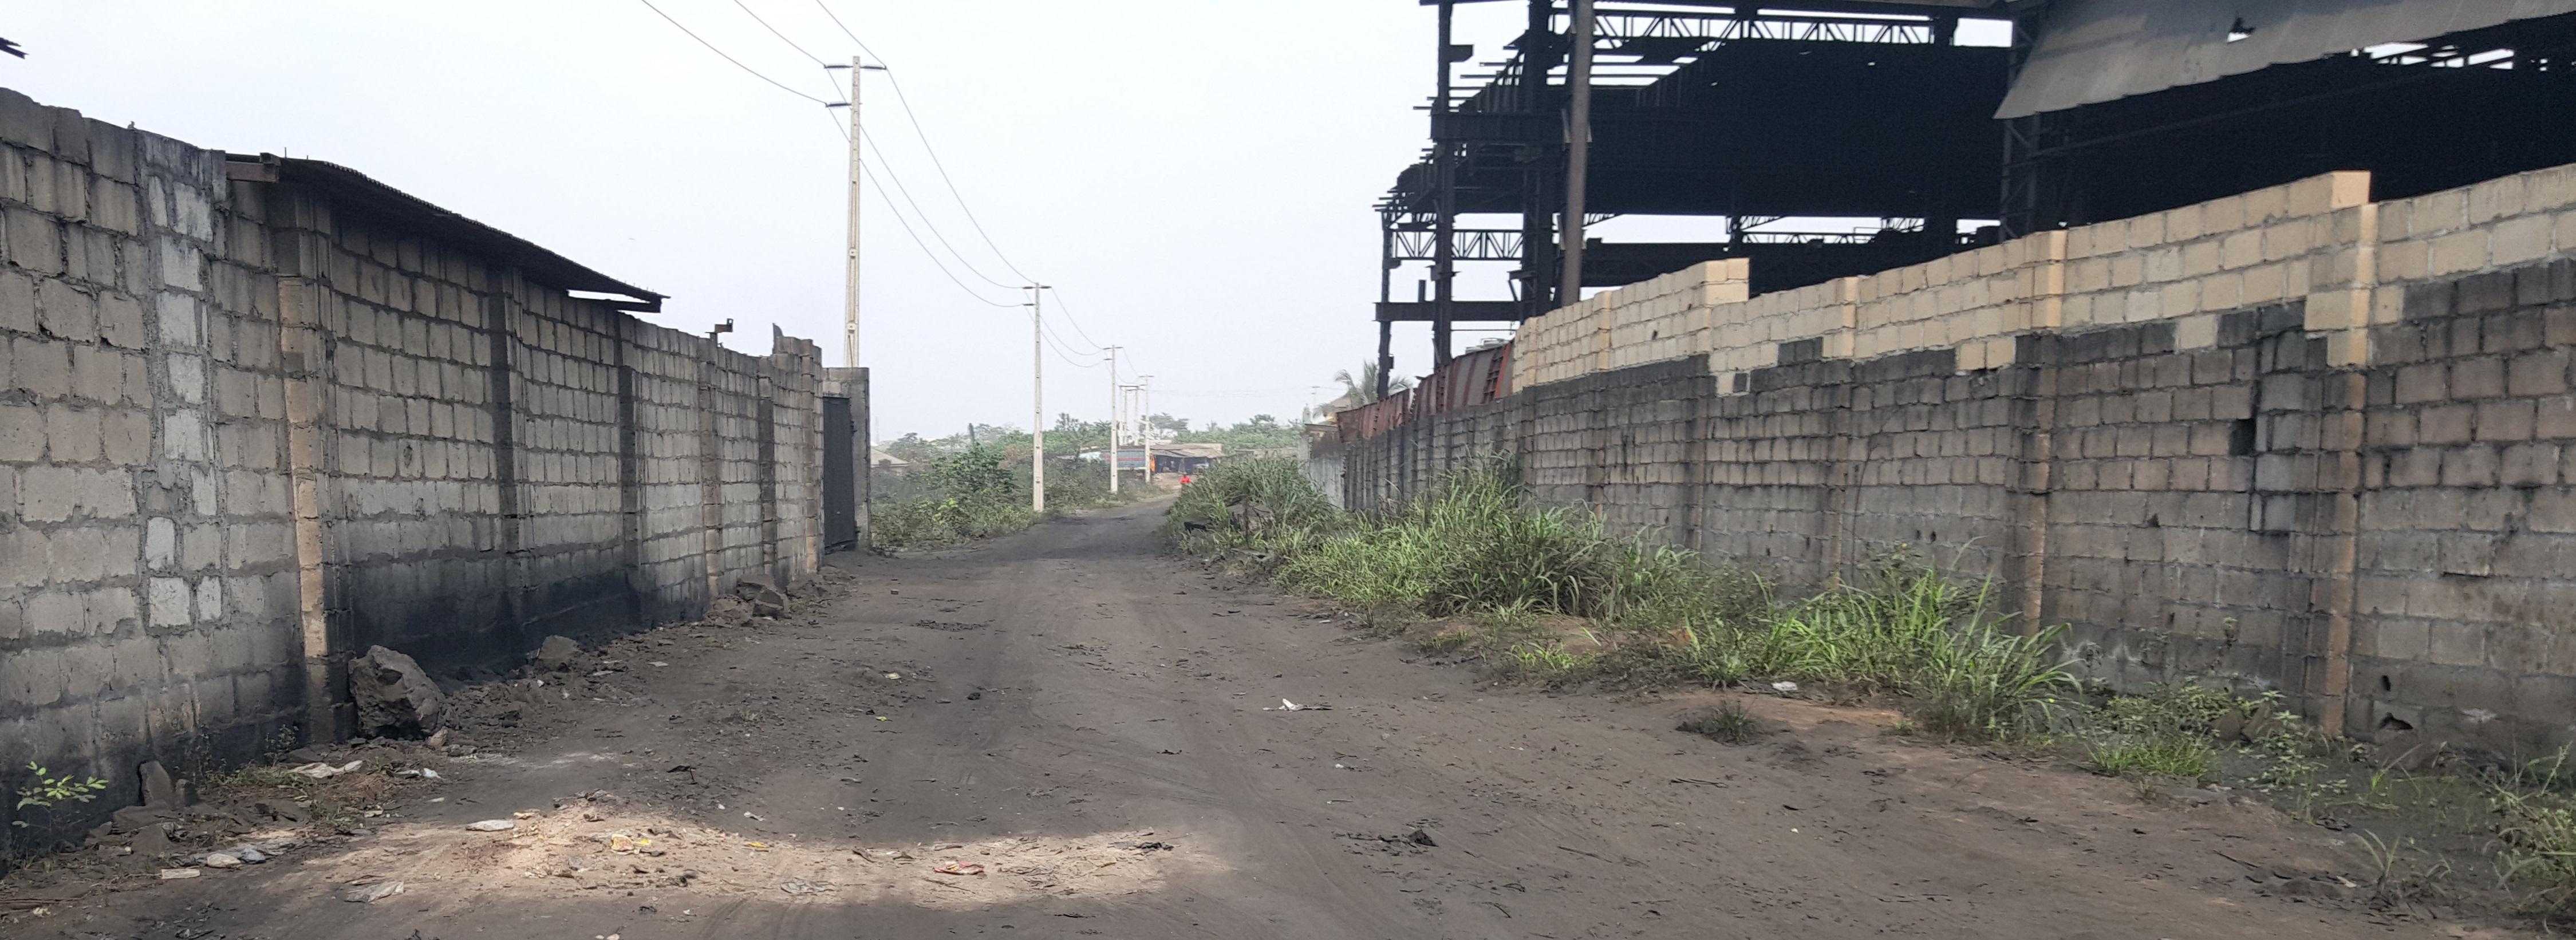 Nigeria Environmental pollution